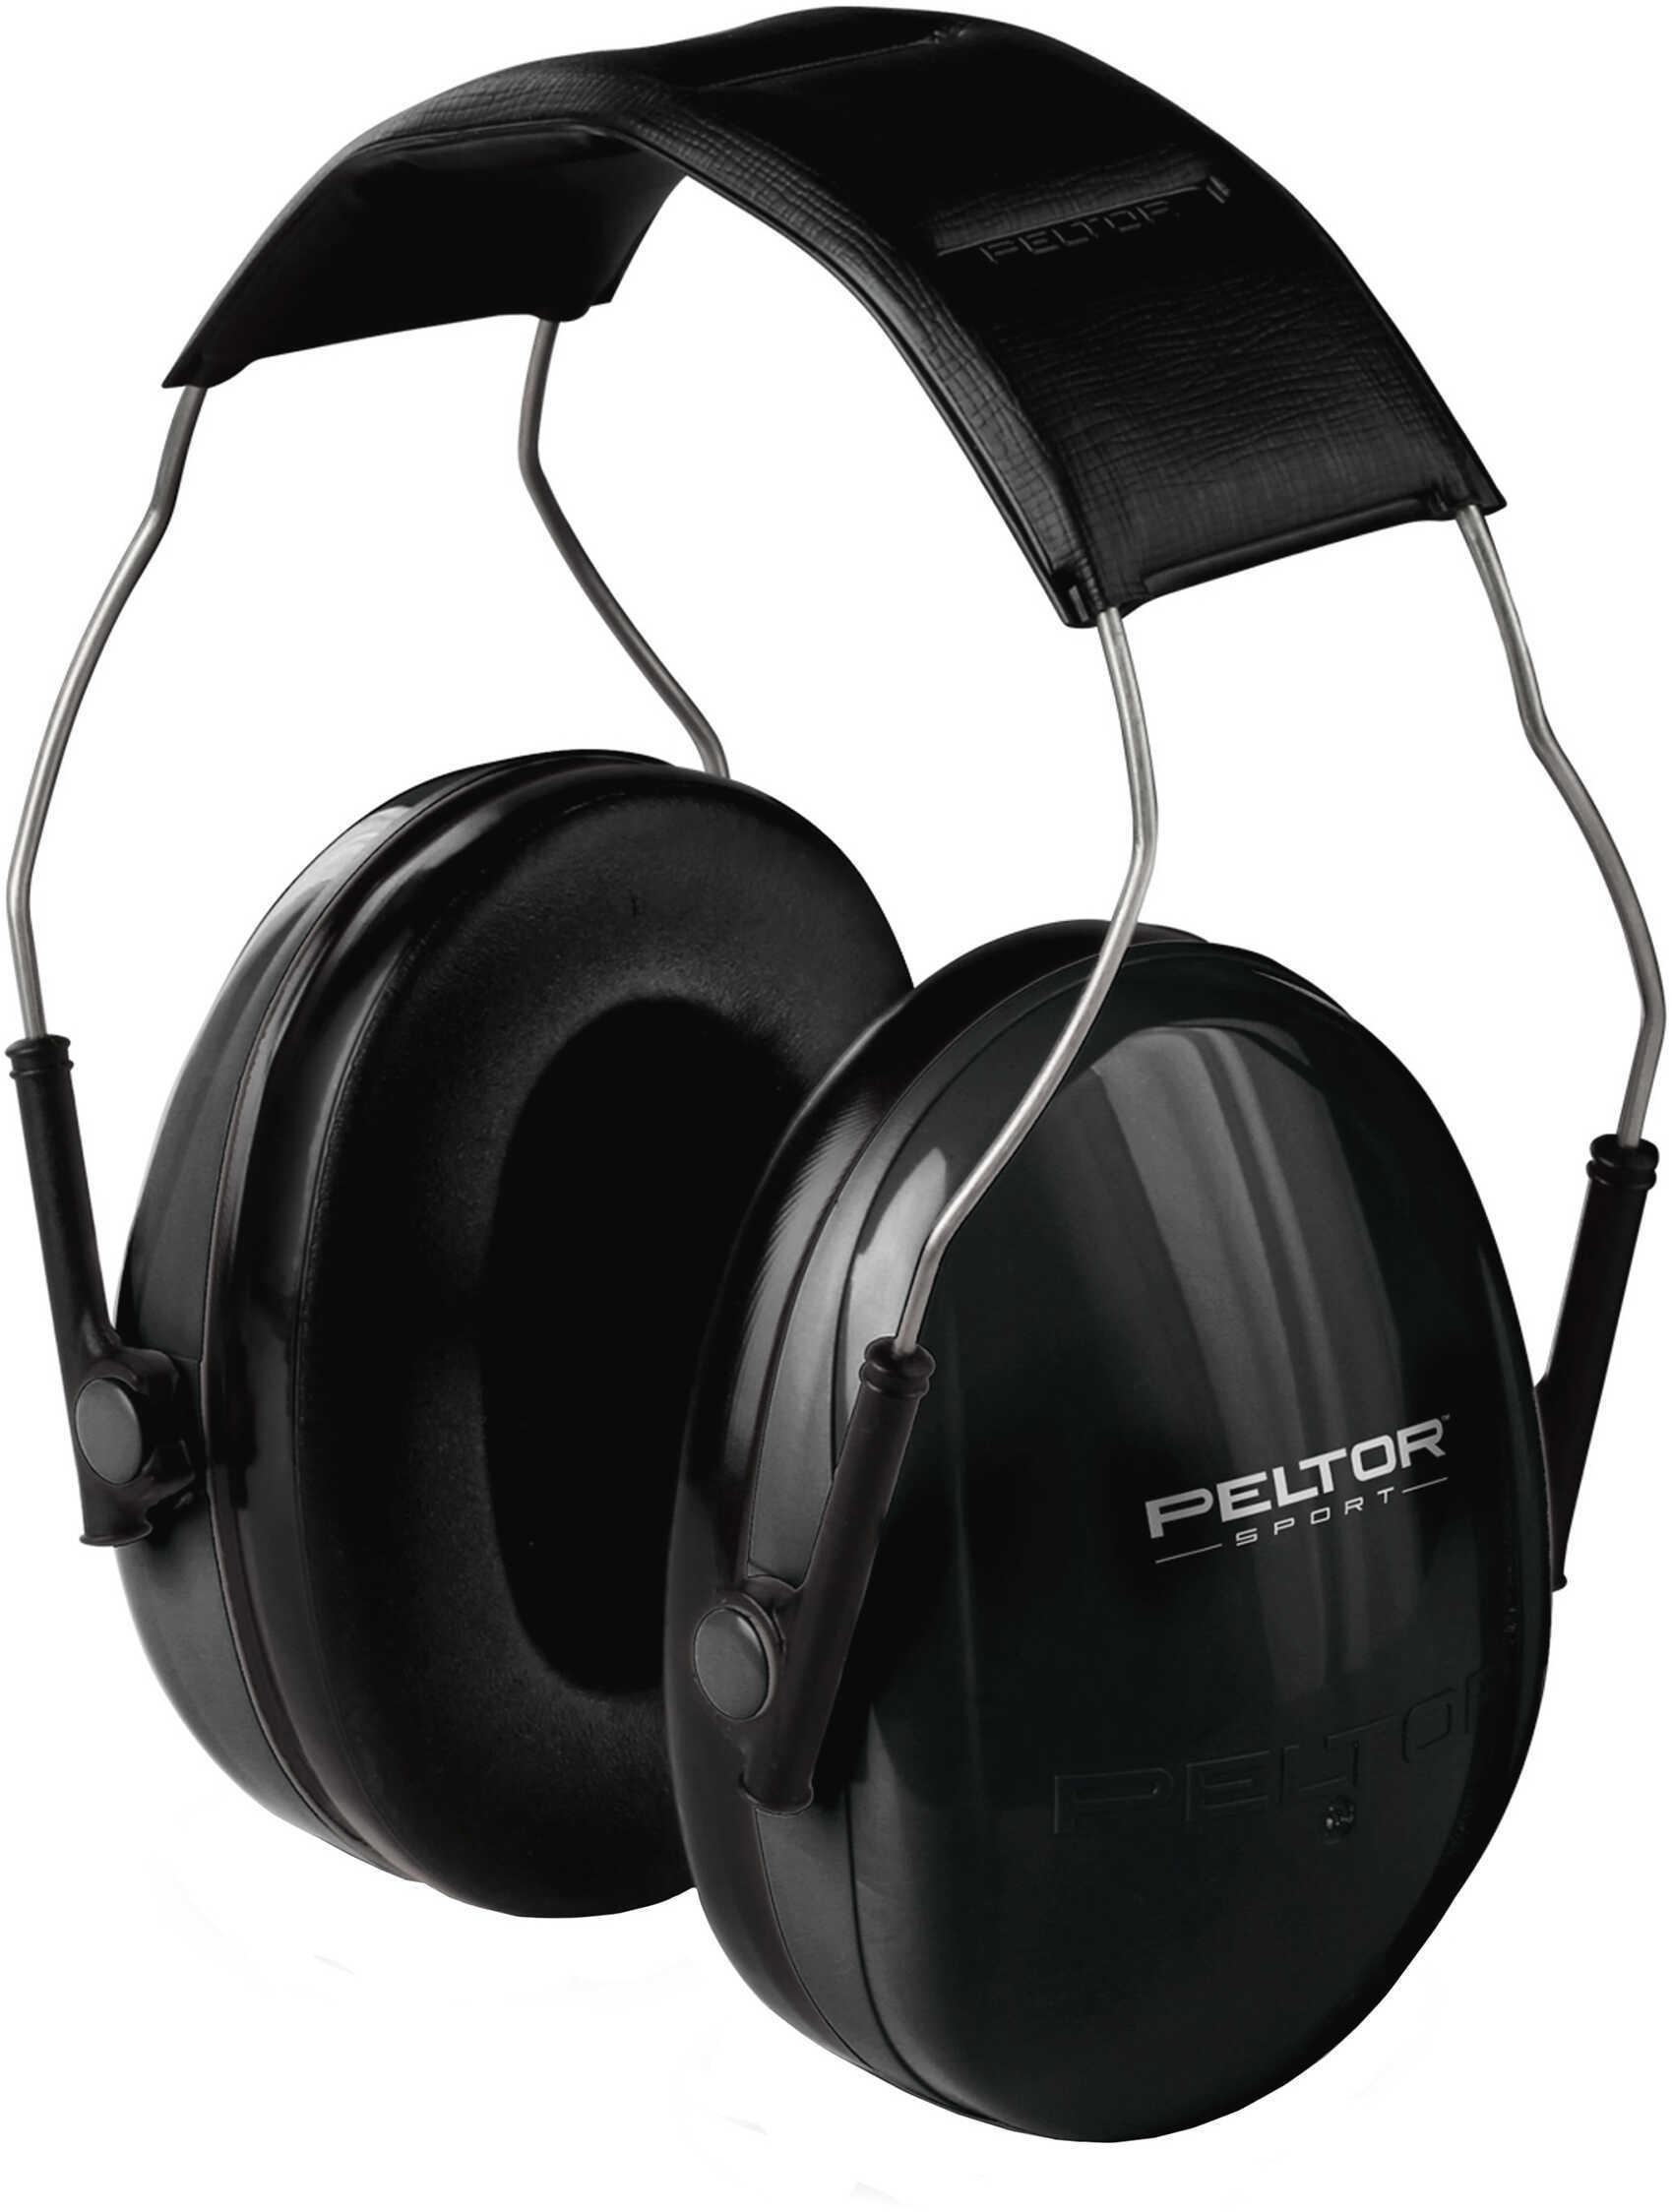 Peltor Youth Earmuffs With Padded & Adjustable Headband & Liquid Foam Cushions Md: 97070